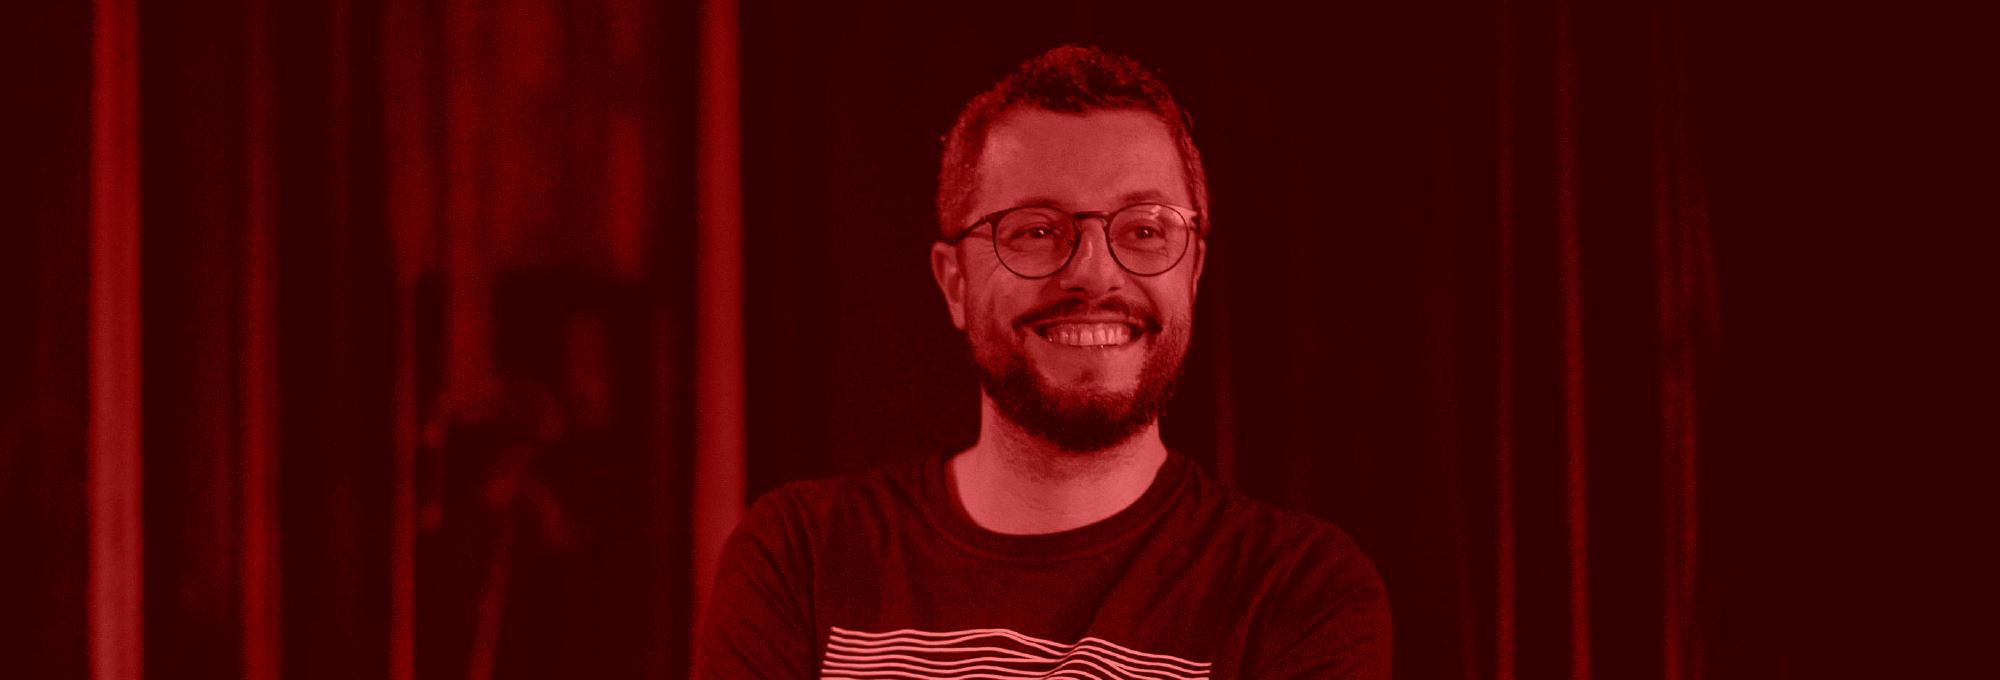 Workshop Online com Marco Dutra